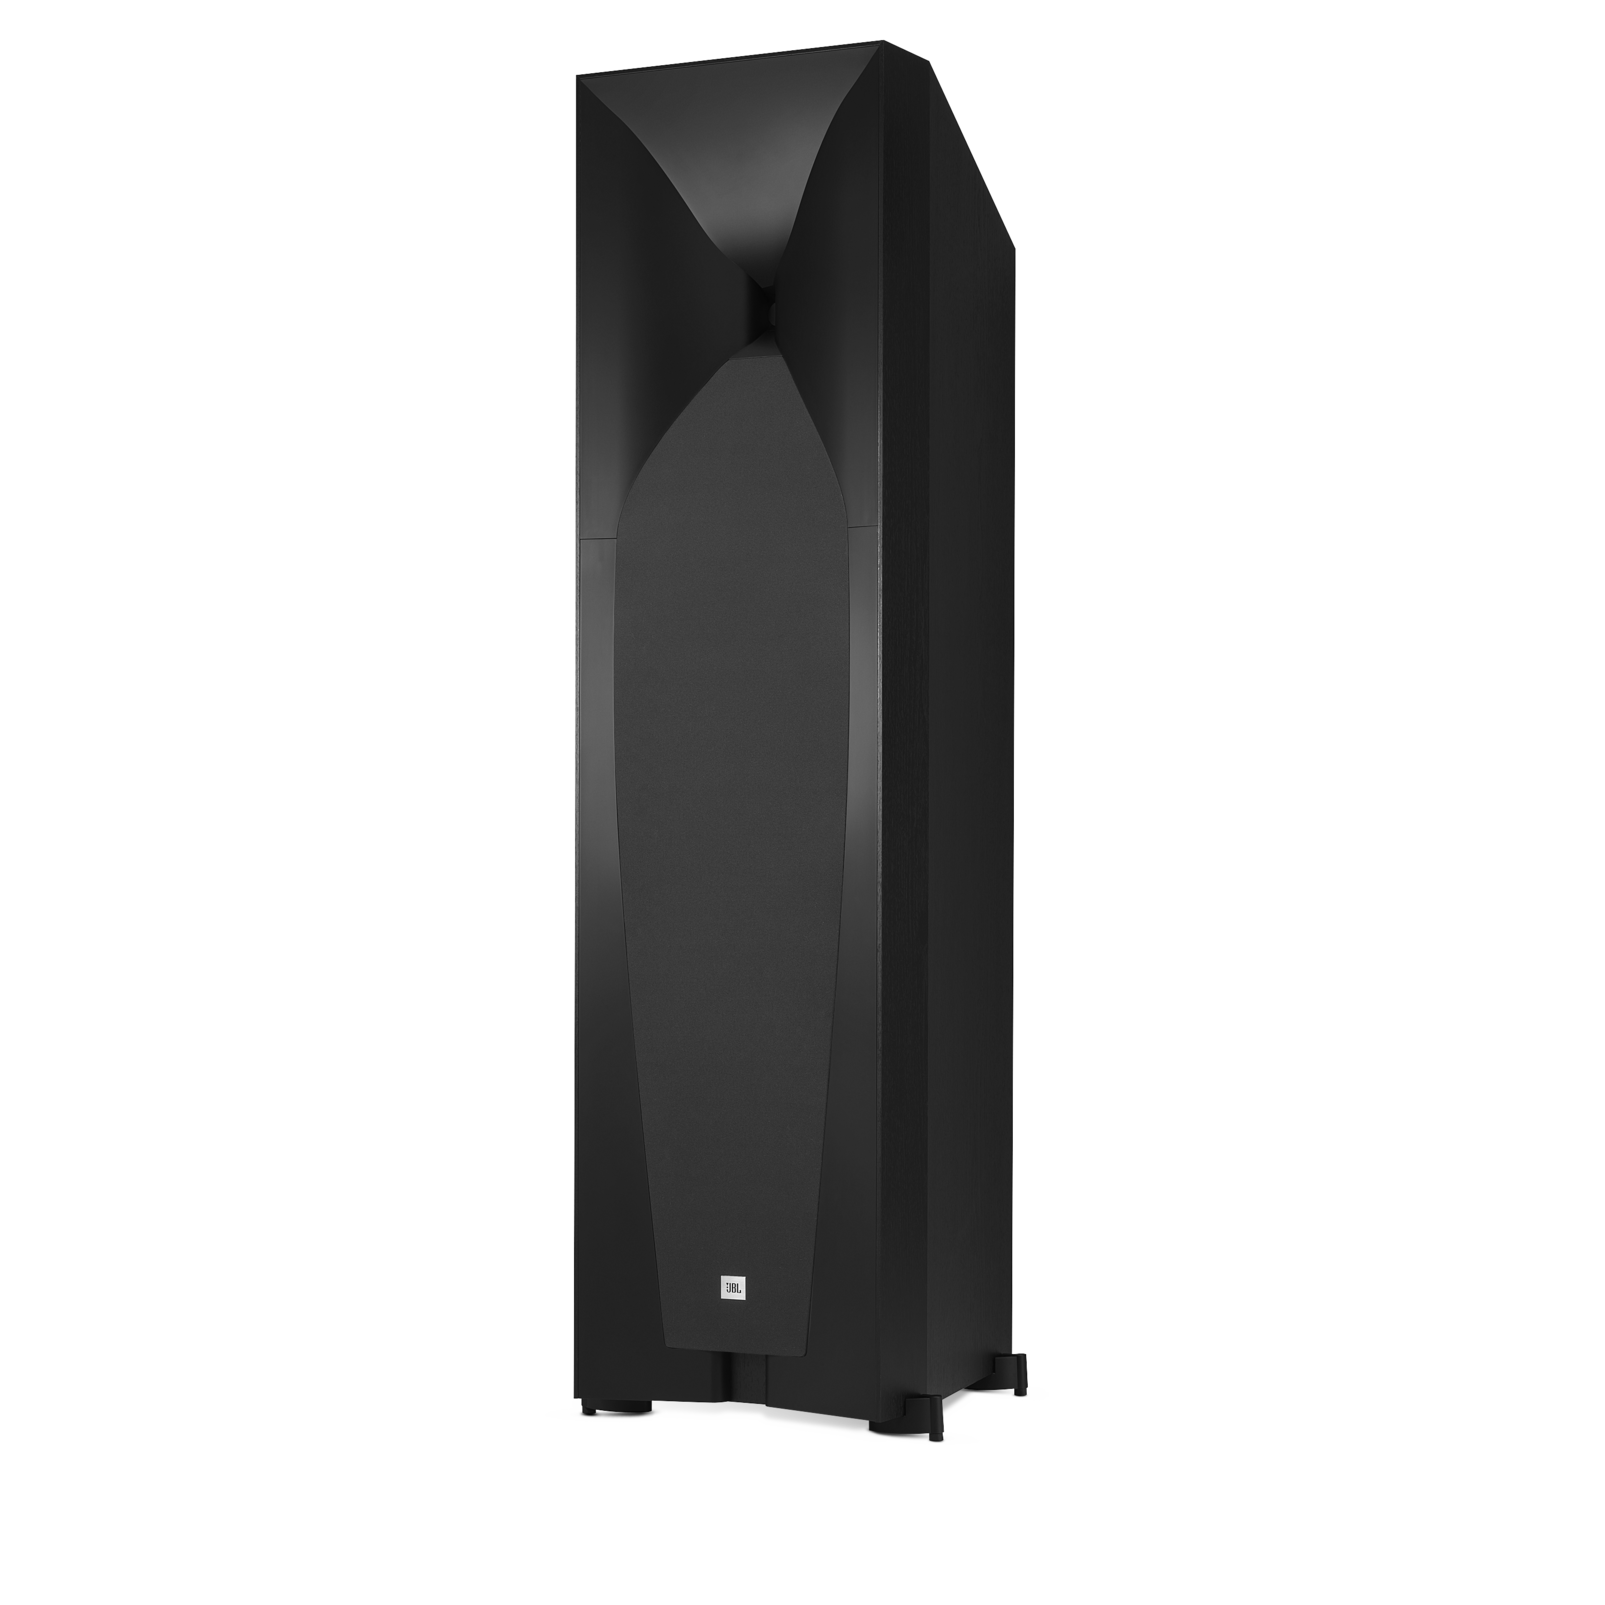 JBL Studio 590 Dual 8 inch Floorstanding Loudspeaker (Each) $444.99 at JBL.com